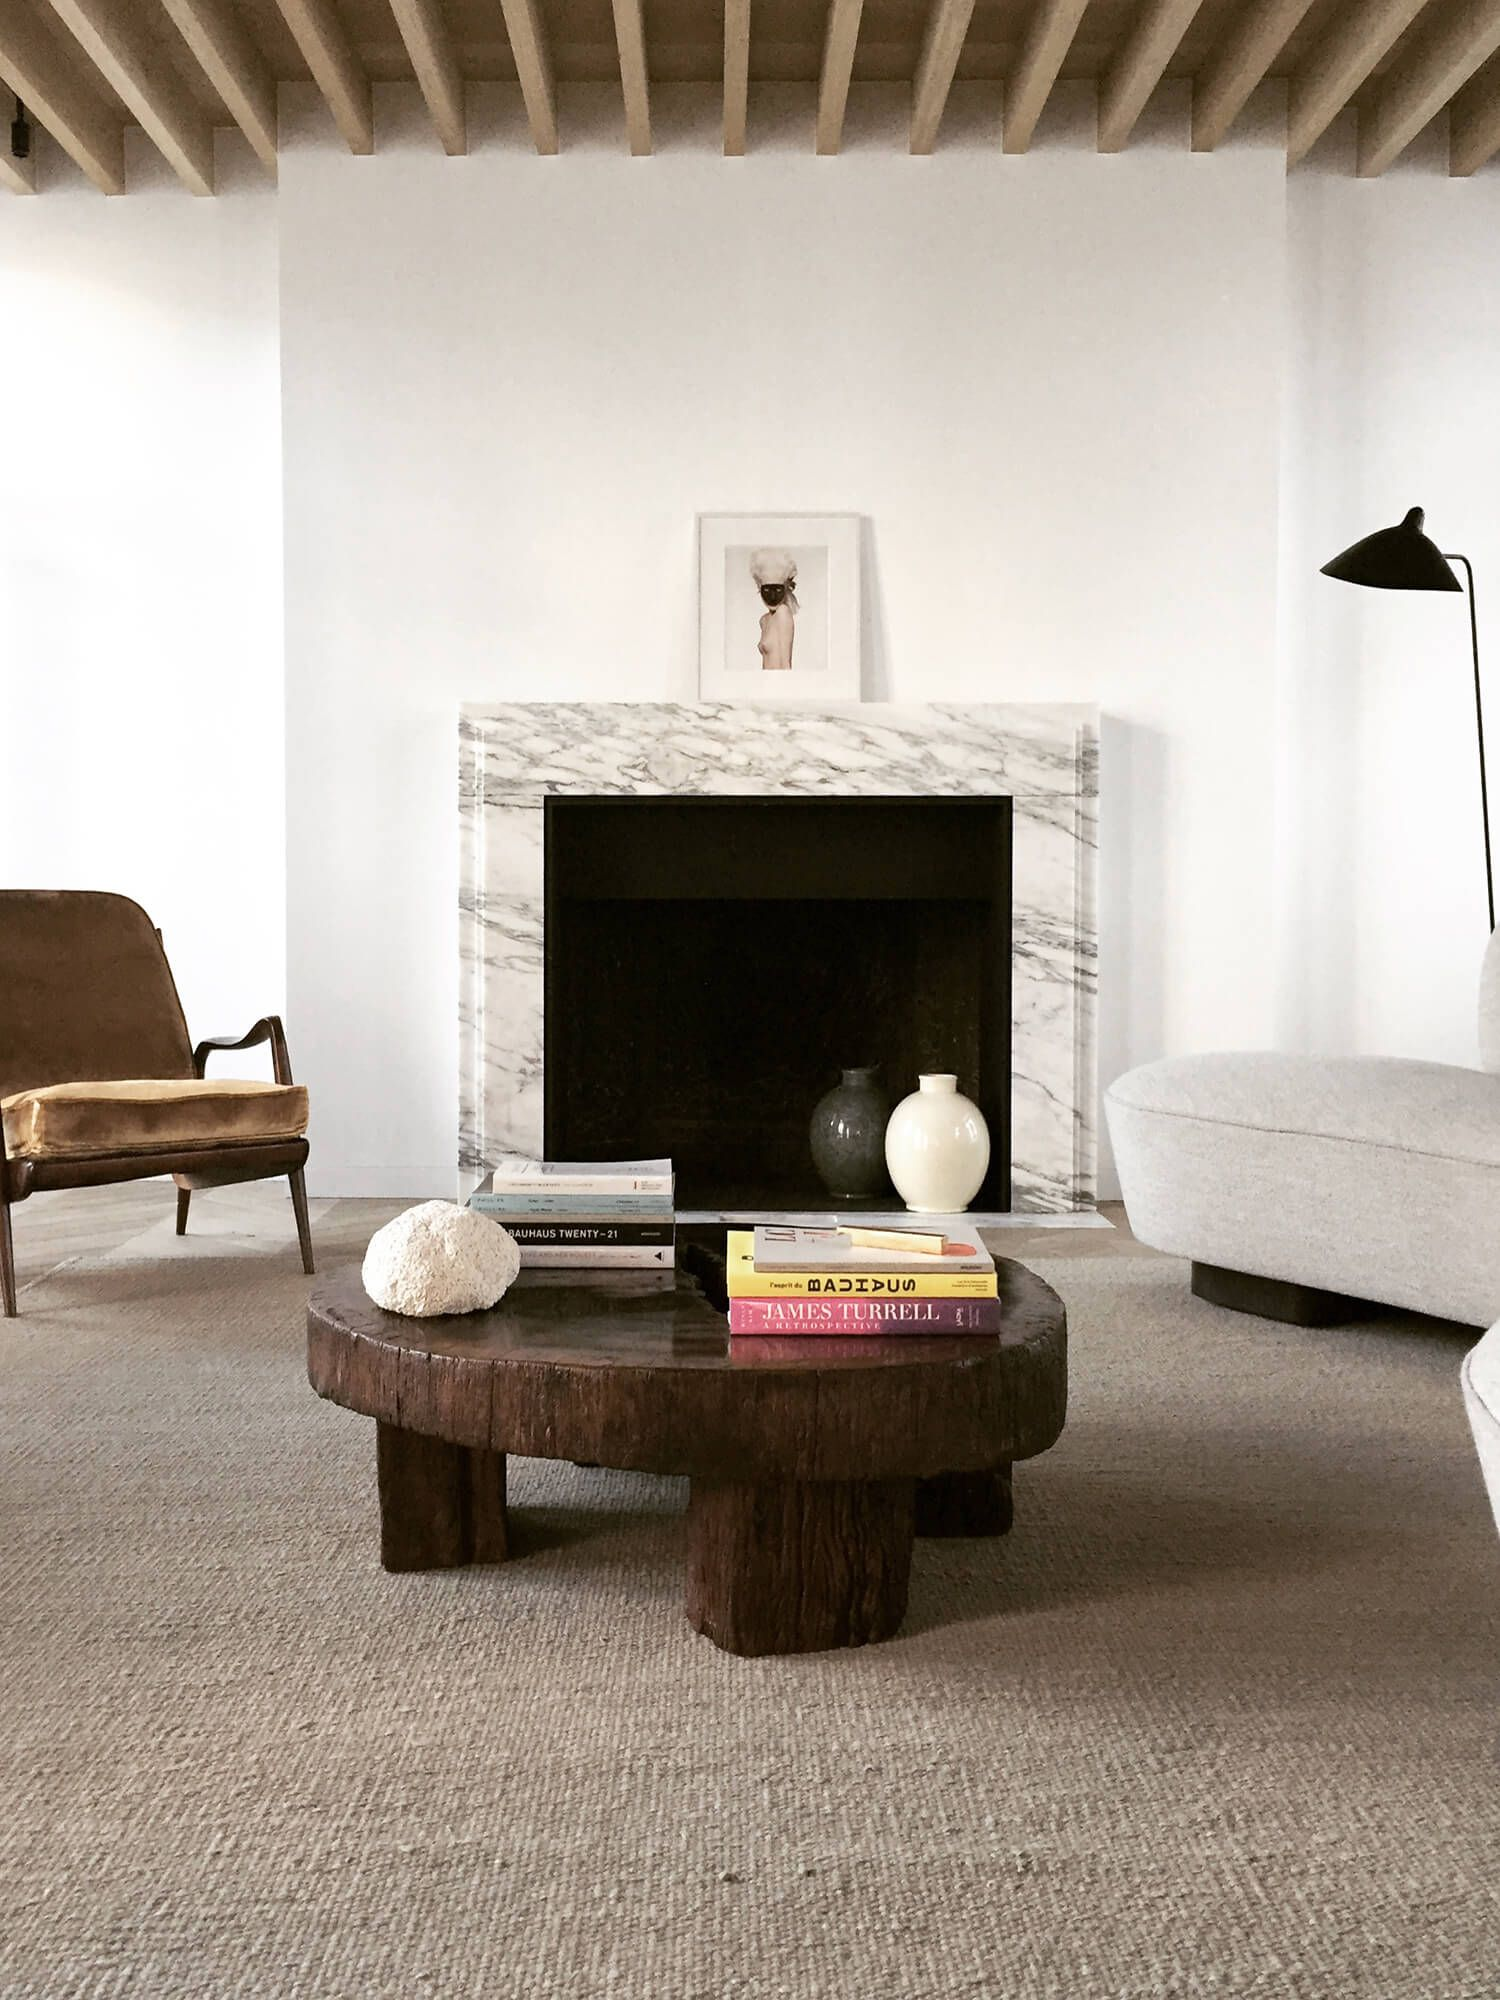 Est living mk house 13 luxury apartments luxury homes interior modern interior design